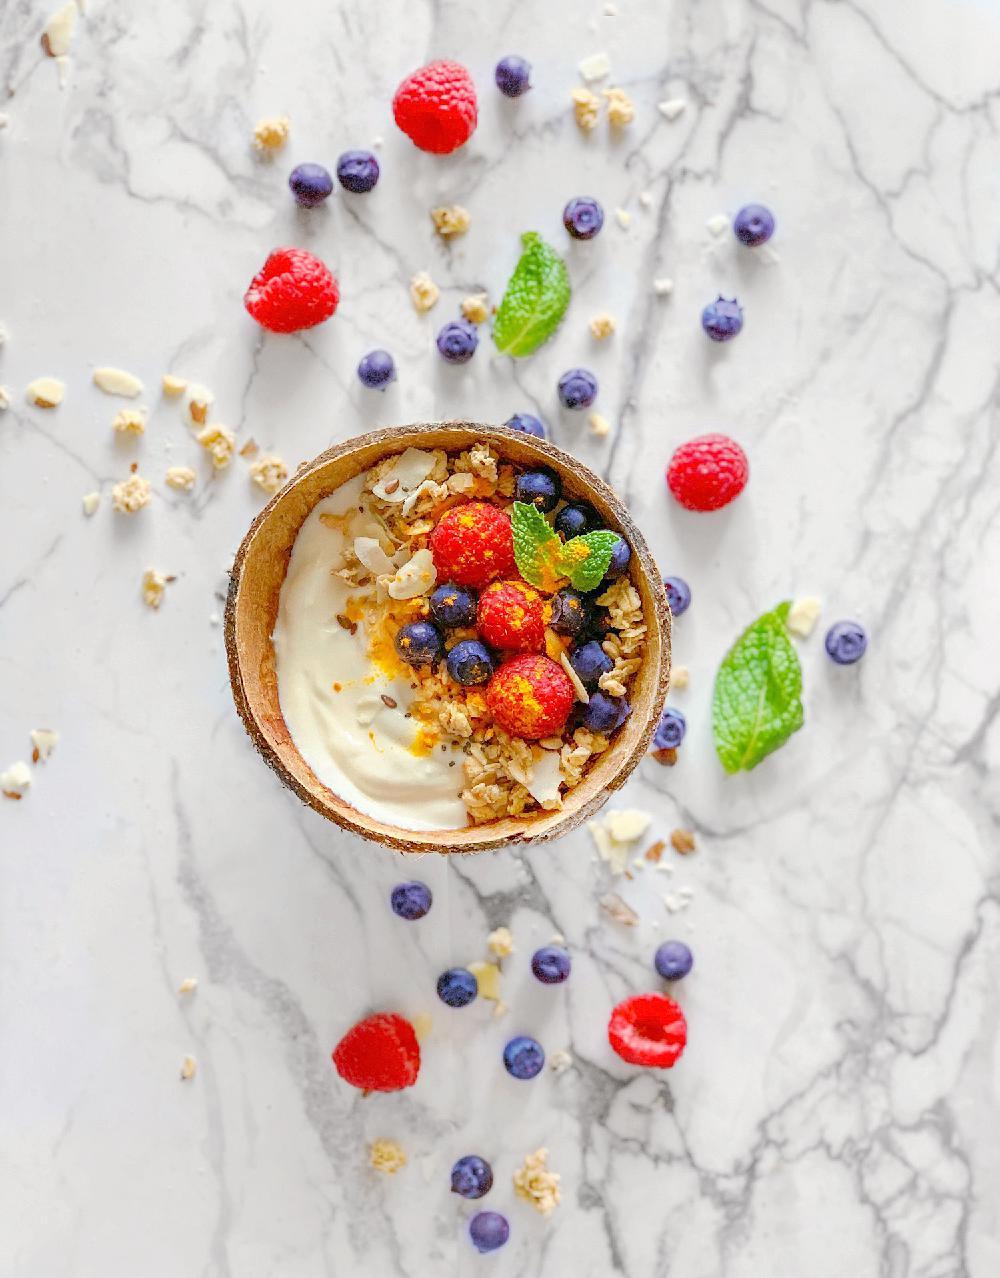 winter bliss bowls using granola, yogurt, fruits and turmeric